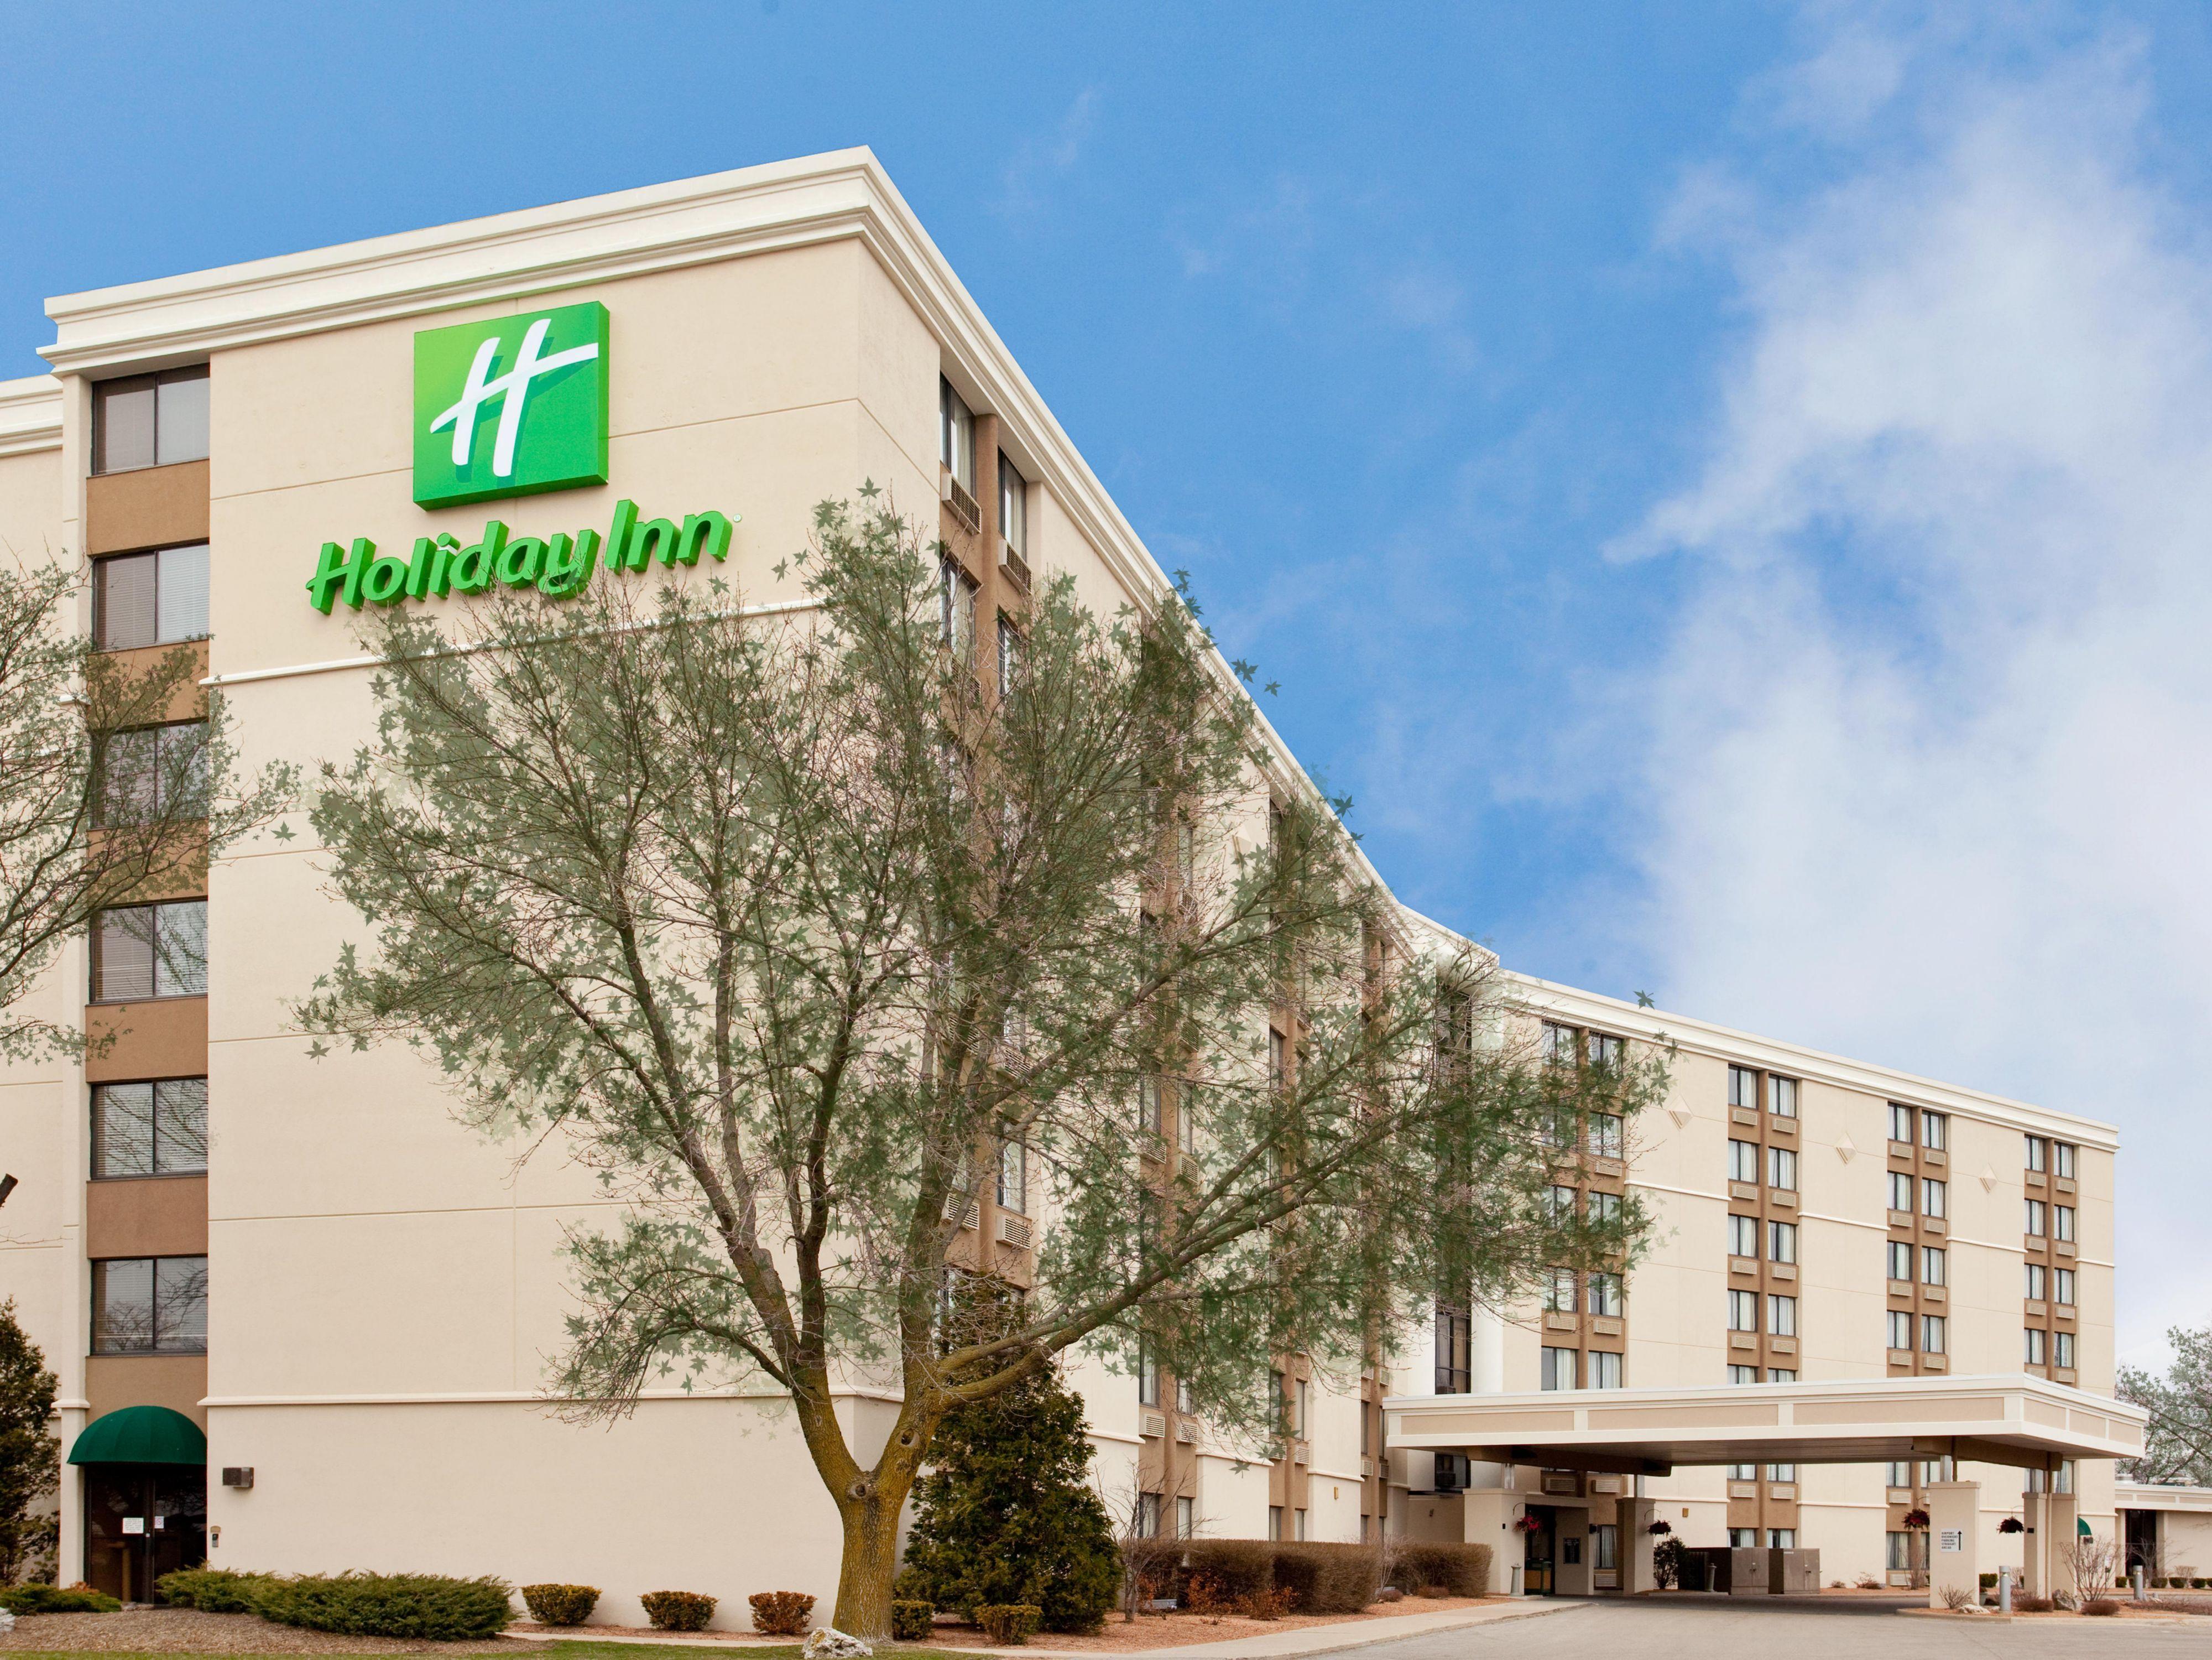 Holiday Inn Rockford(I-90&Rt 20/State St) Hotel by IHG